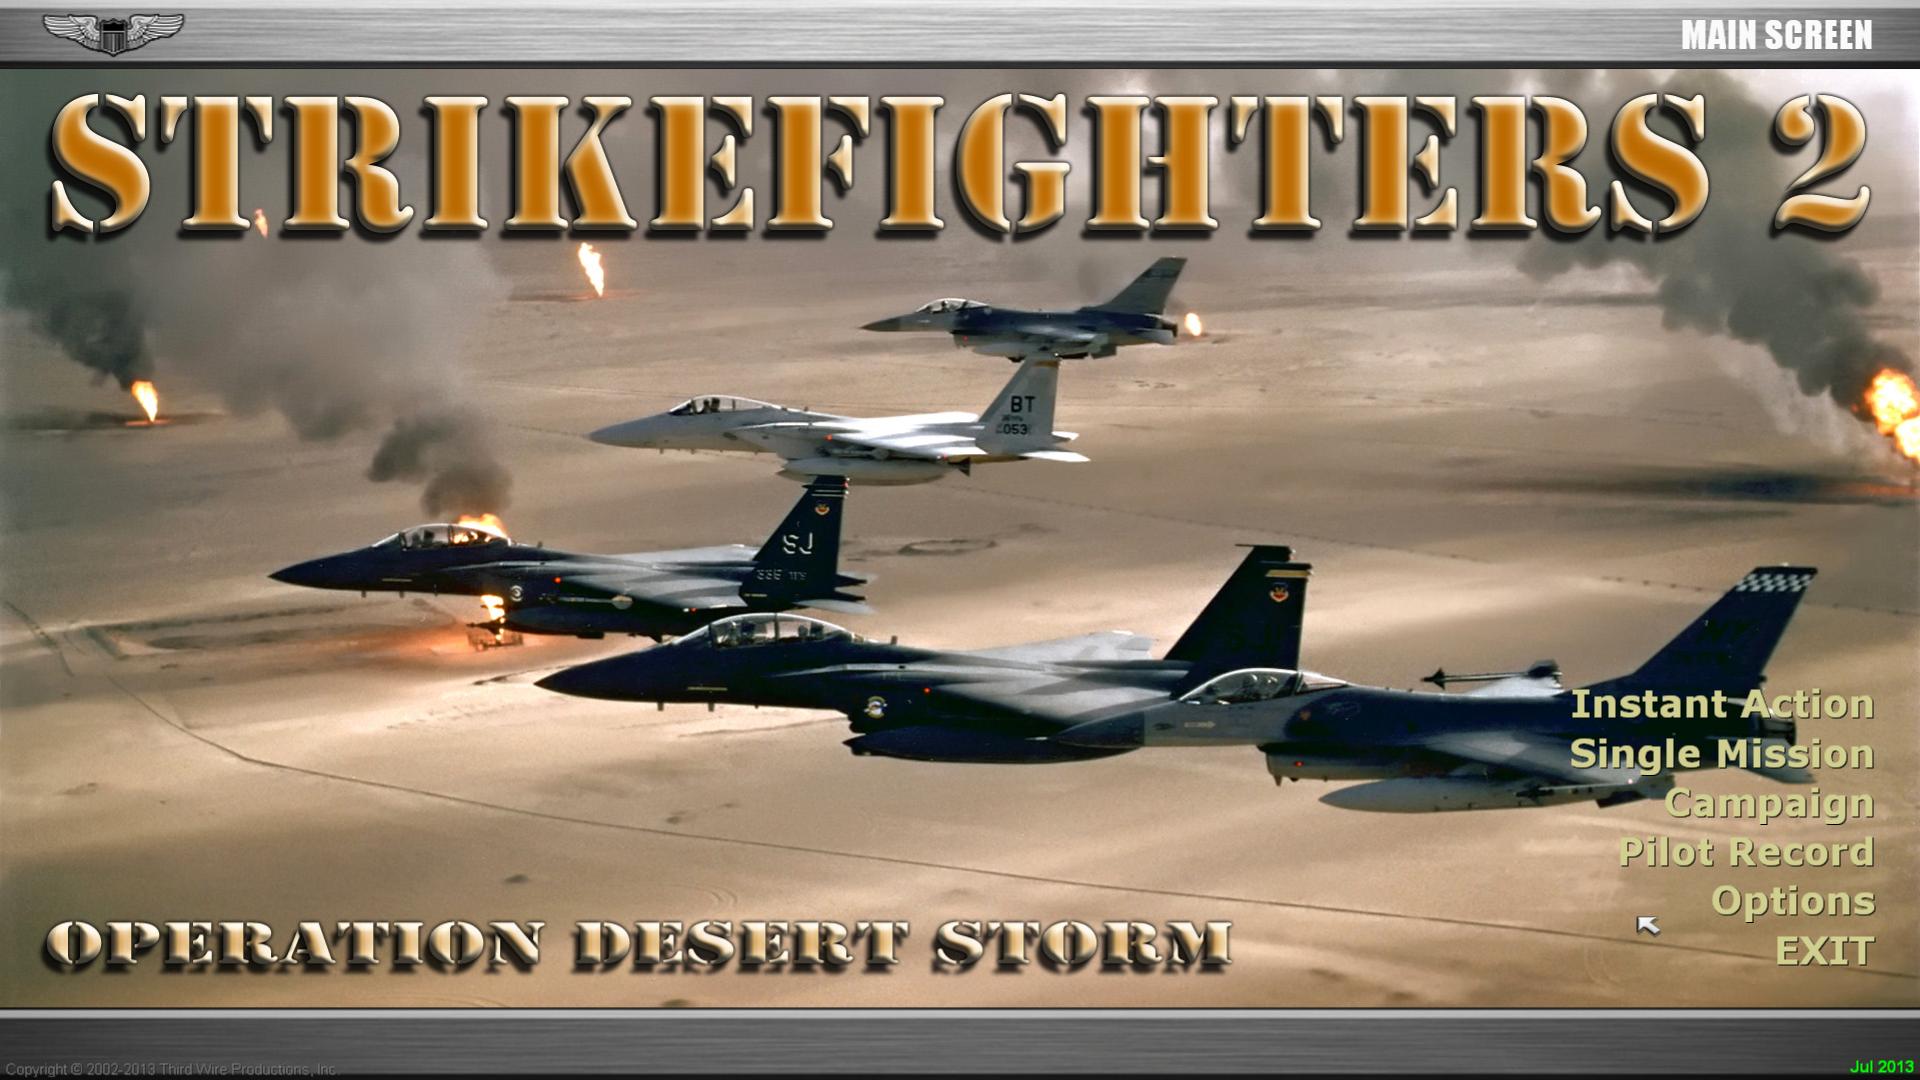 StrikeFighters2 Desert Storm Hi-Res 1920x1080 Menu Screens!